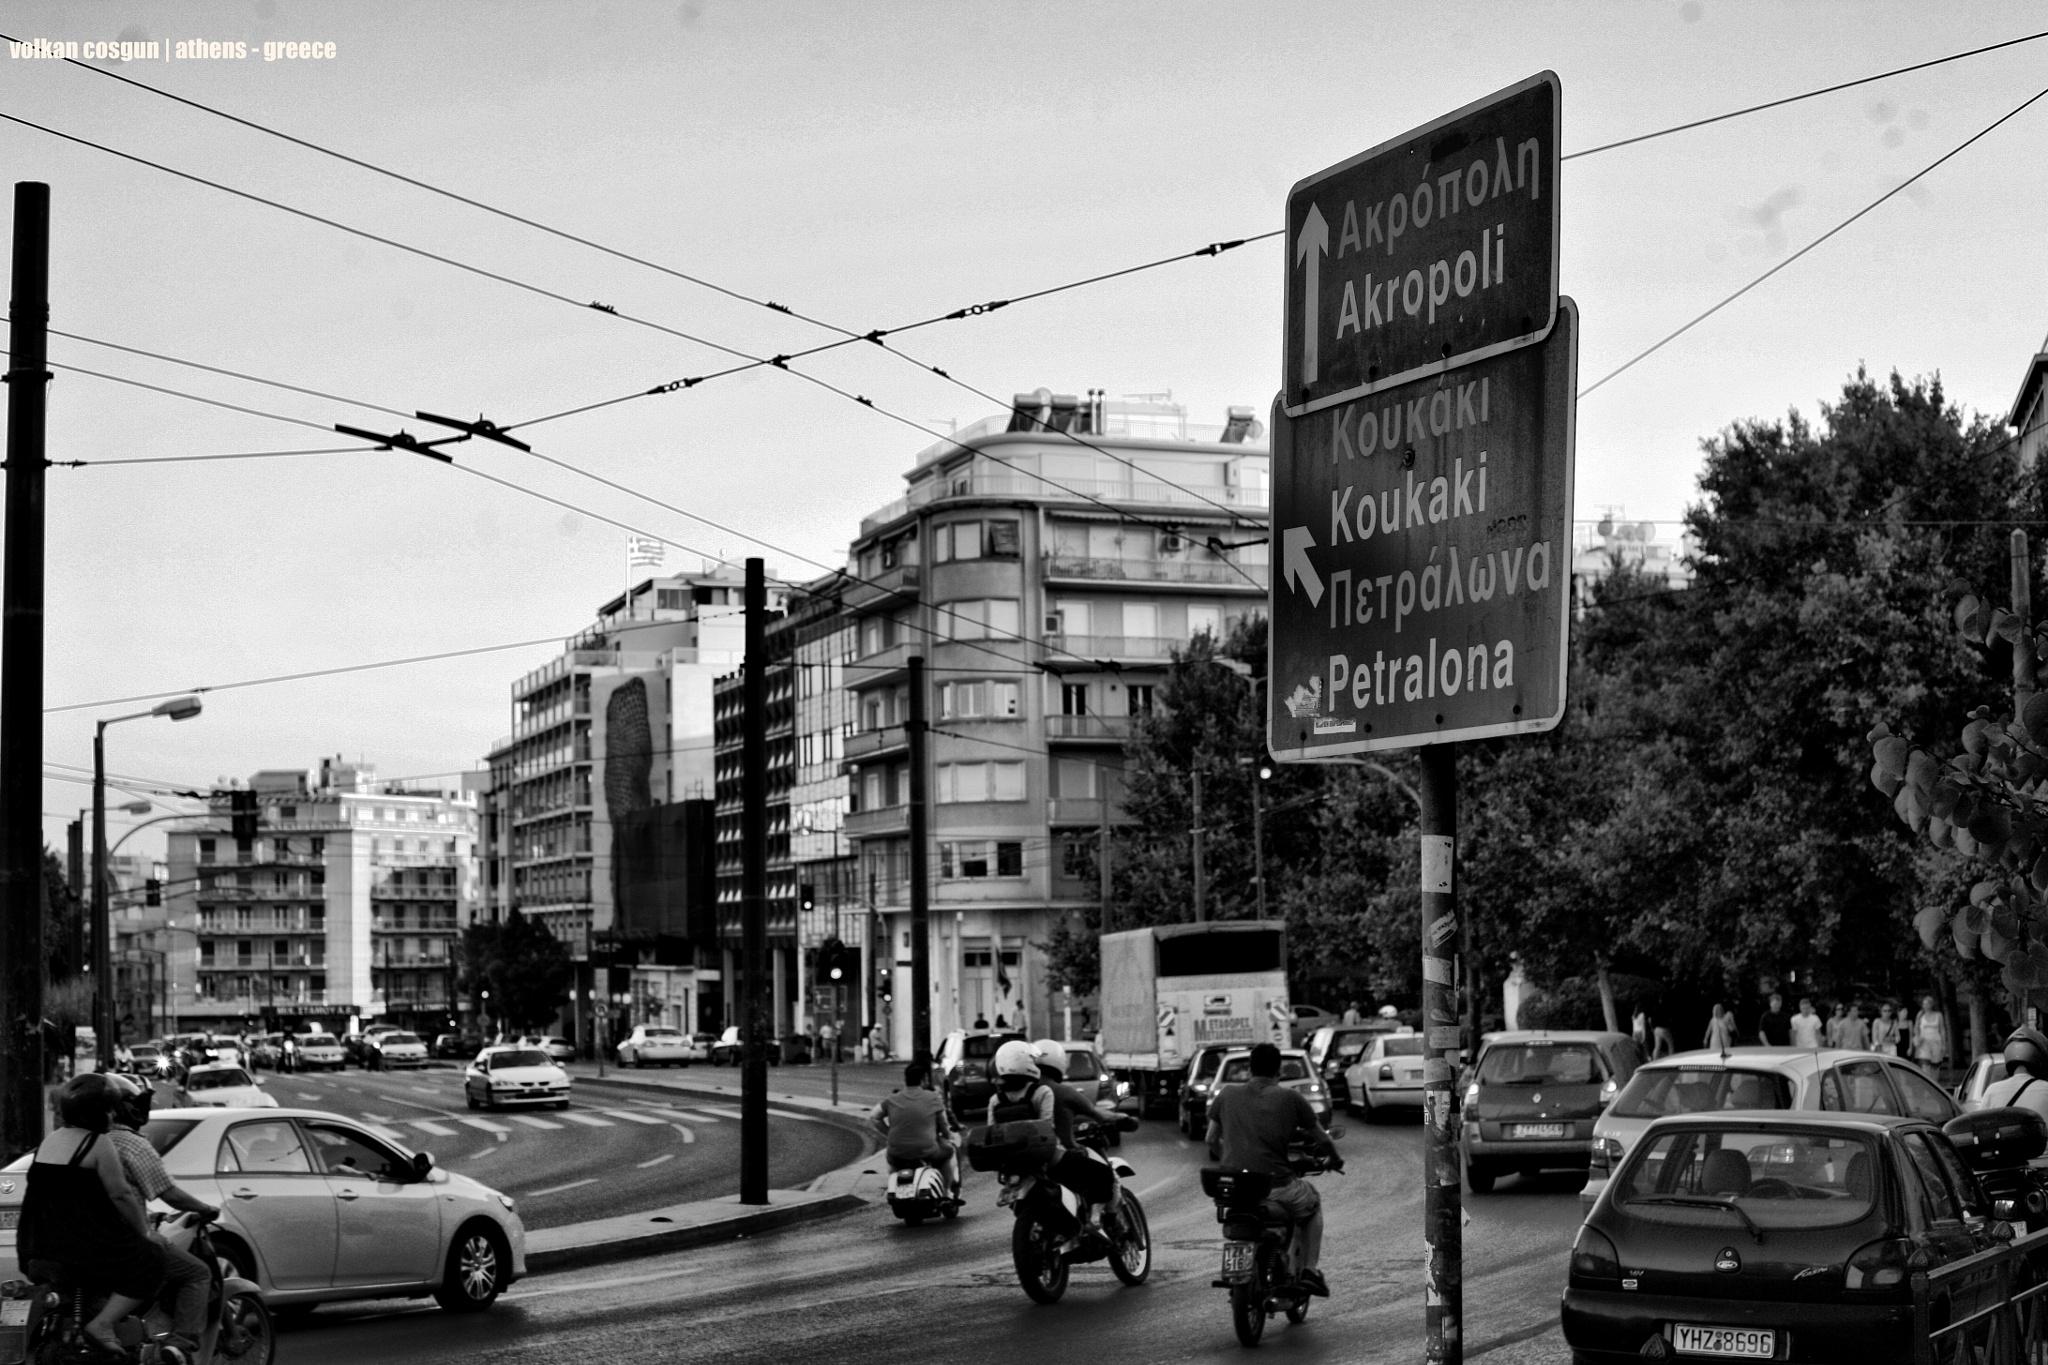 Untitled by Volkan coşğun